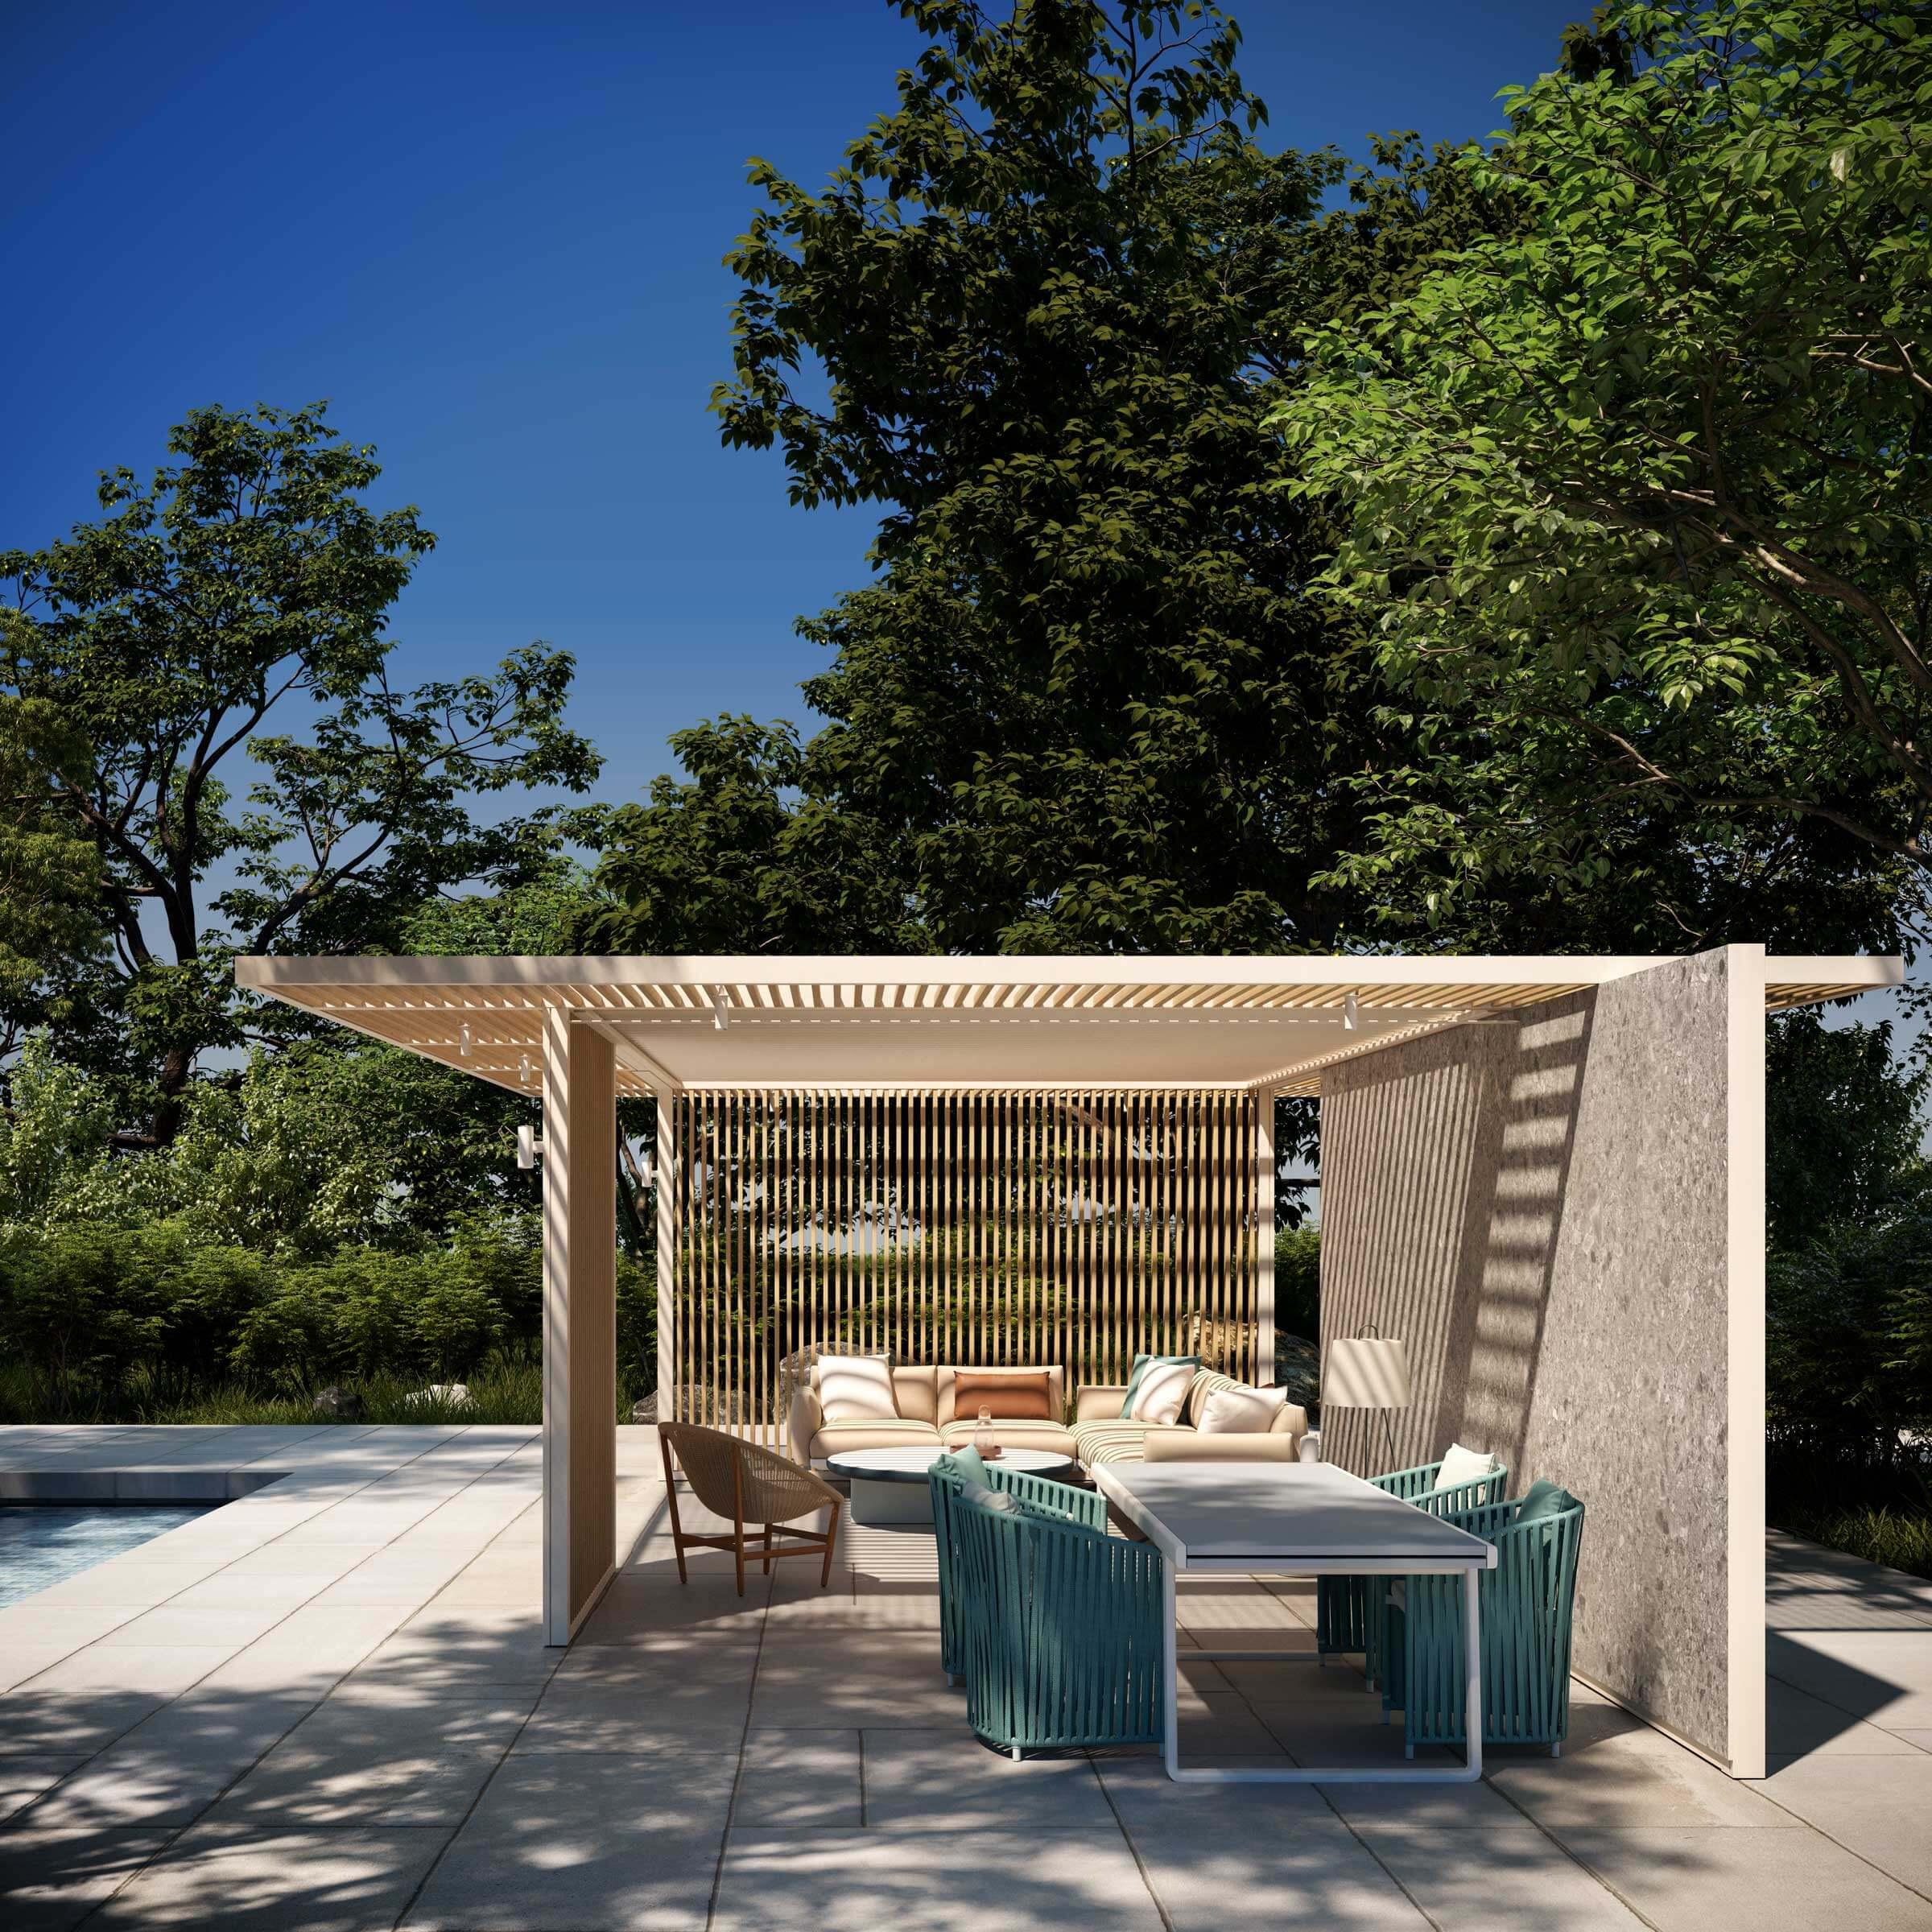 foto_slider_1634_0_pavilion_H_pool_house.jpg